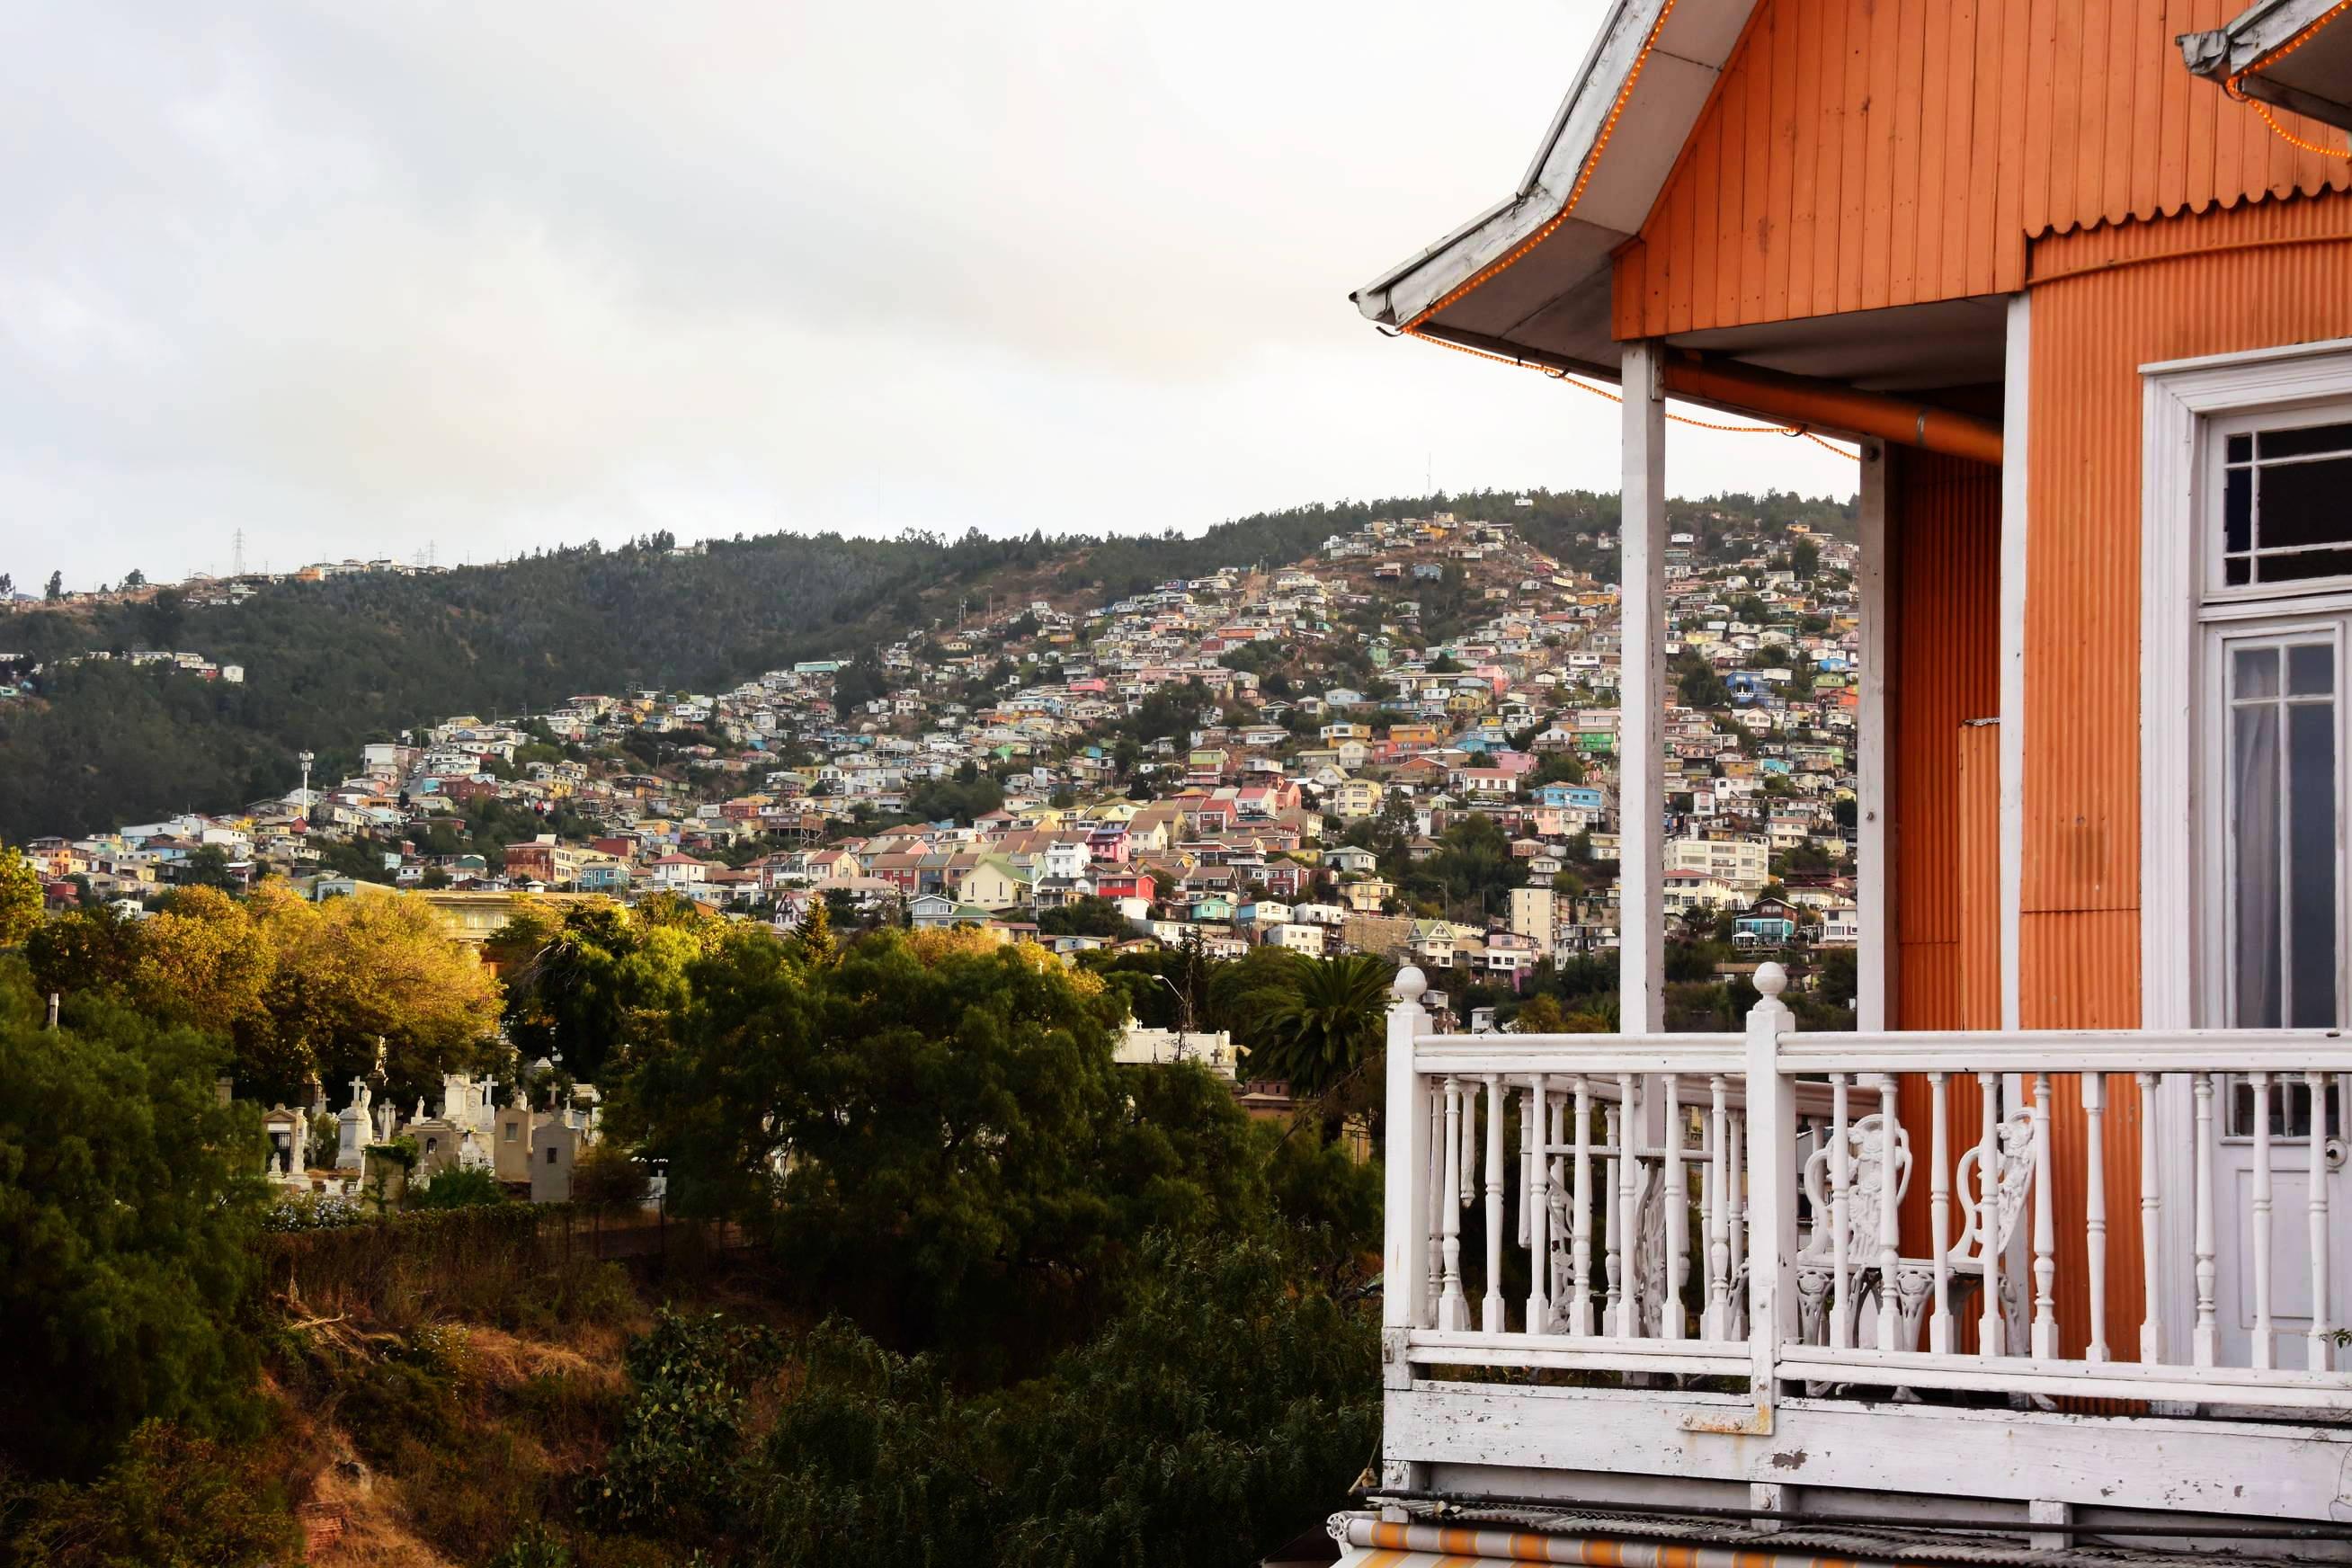 Collines de Valparaiso 2